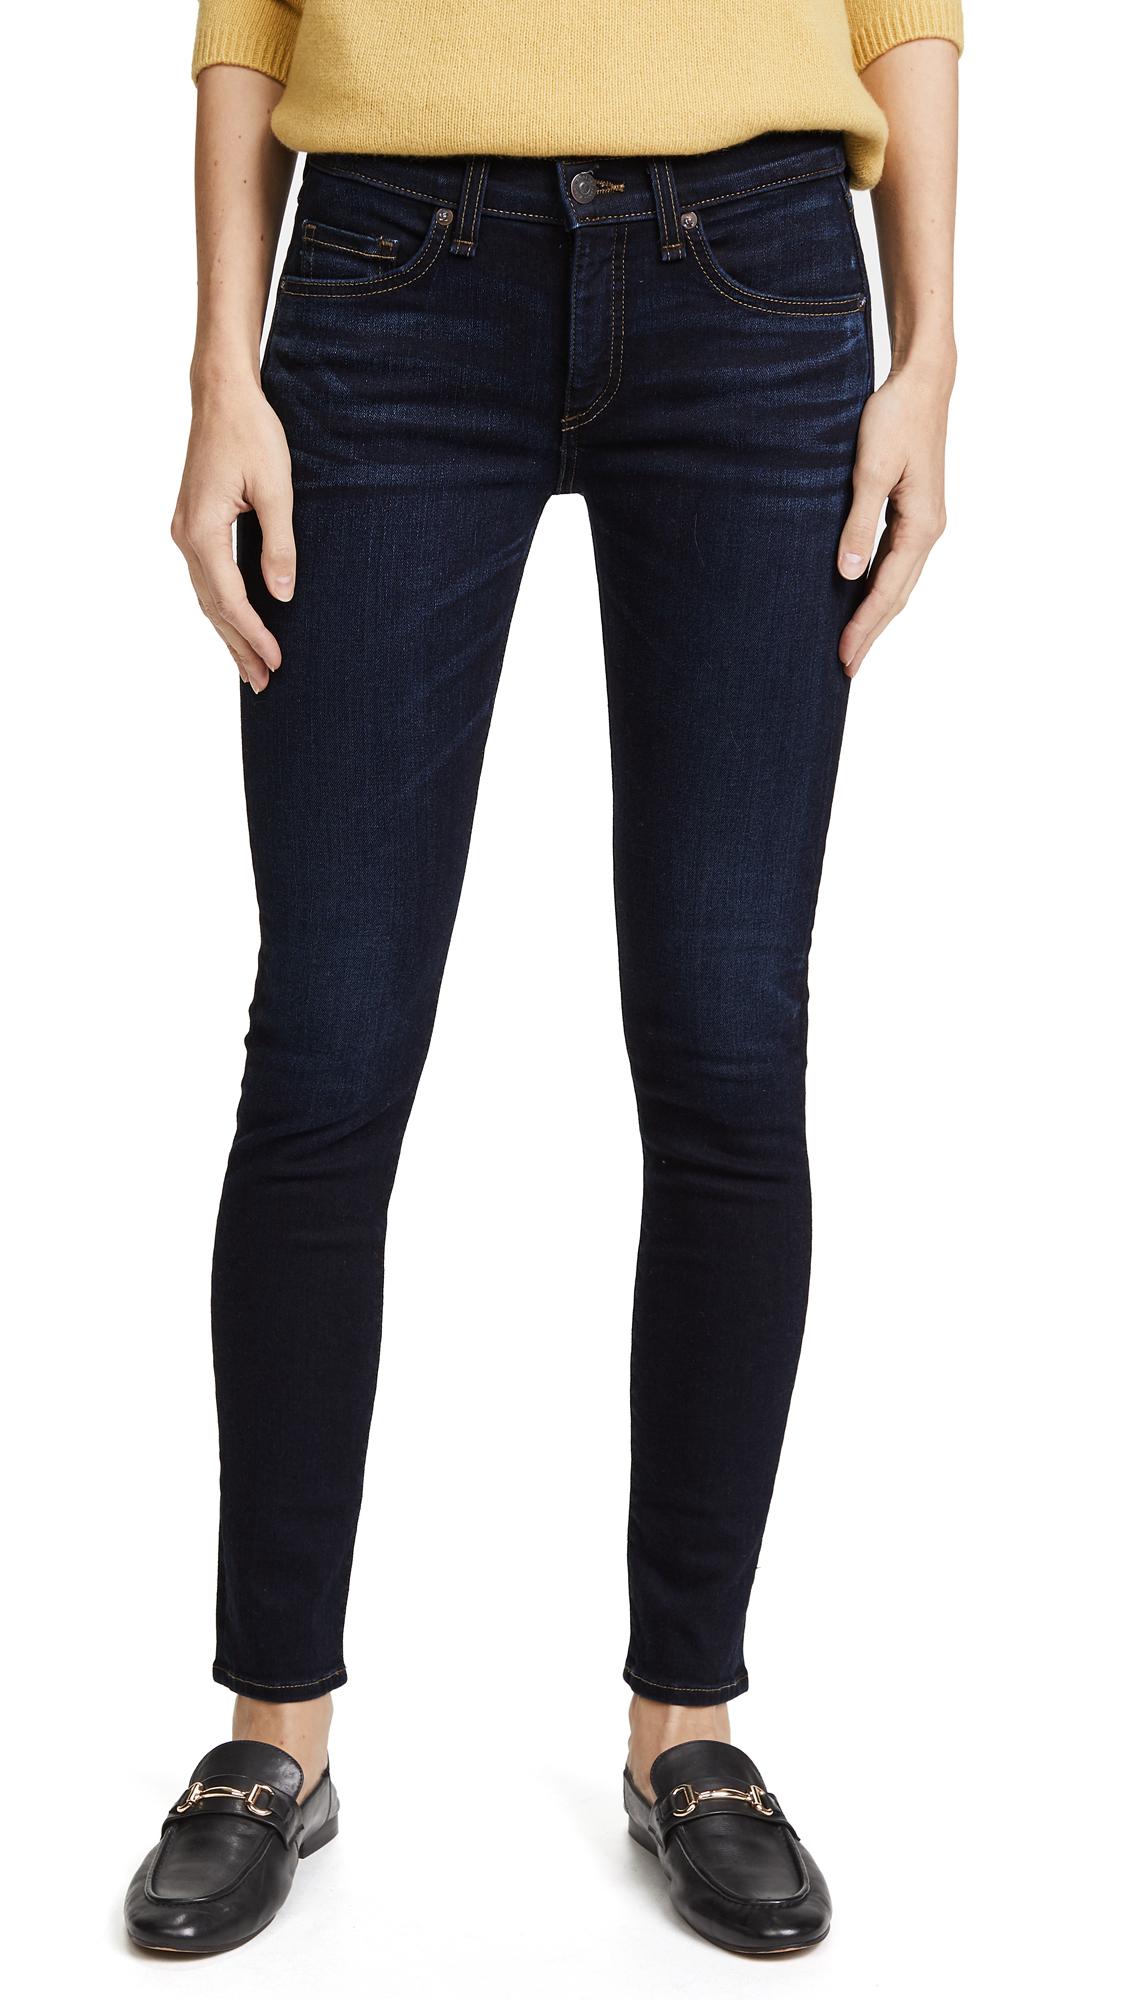 Veronica Beard Jean Brooke Jeans - Deep Blue